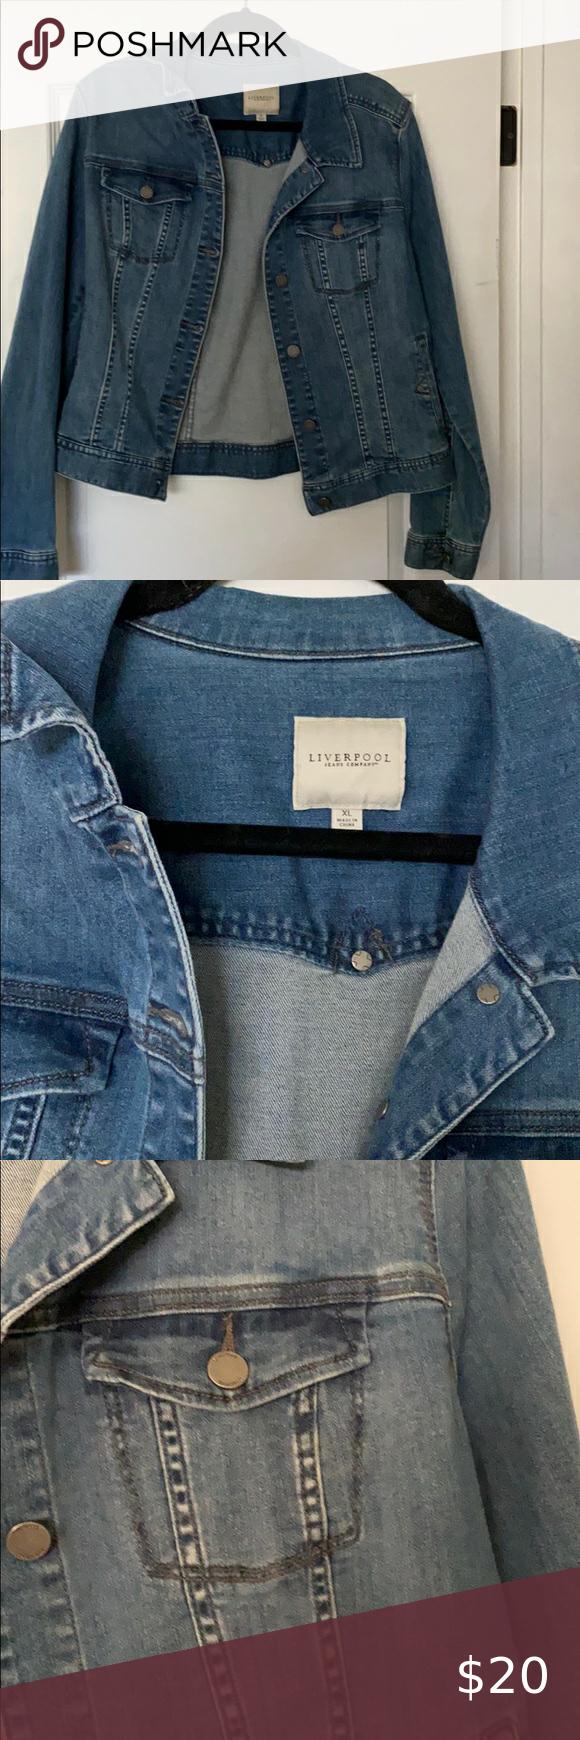 Liverpool Jean Jacket Liverpool Jeans Jean Jacket Jackets [ 1740 x 580 Pixel ]